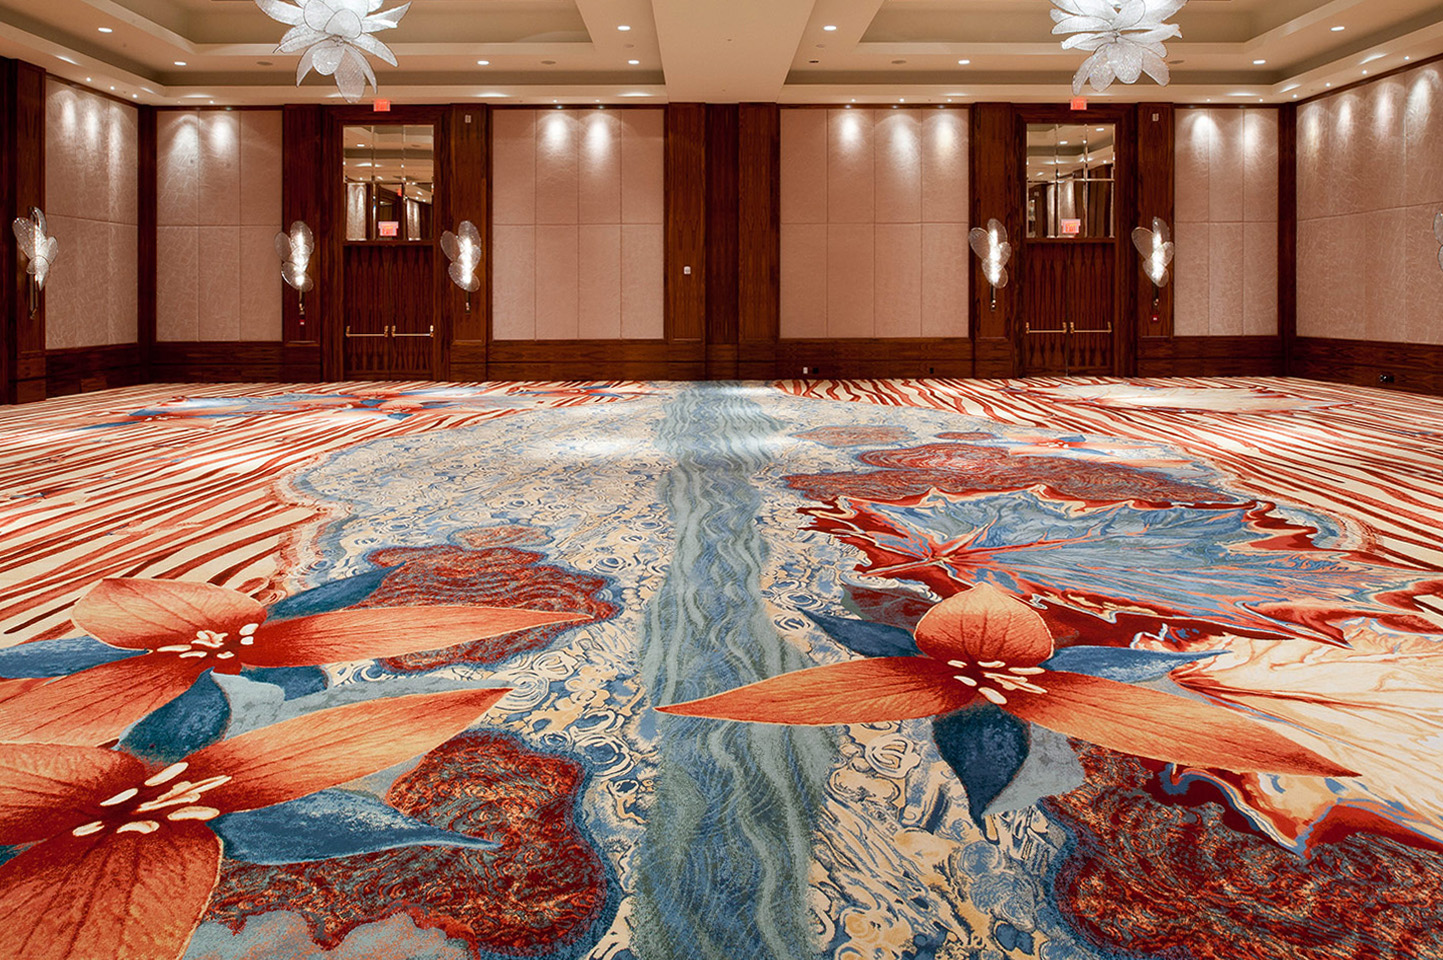 ULSTER Carpets. Ritz Carlton, Toronto.